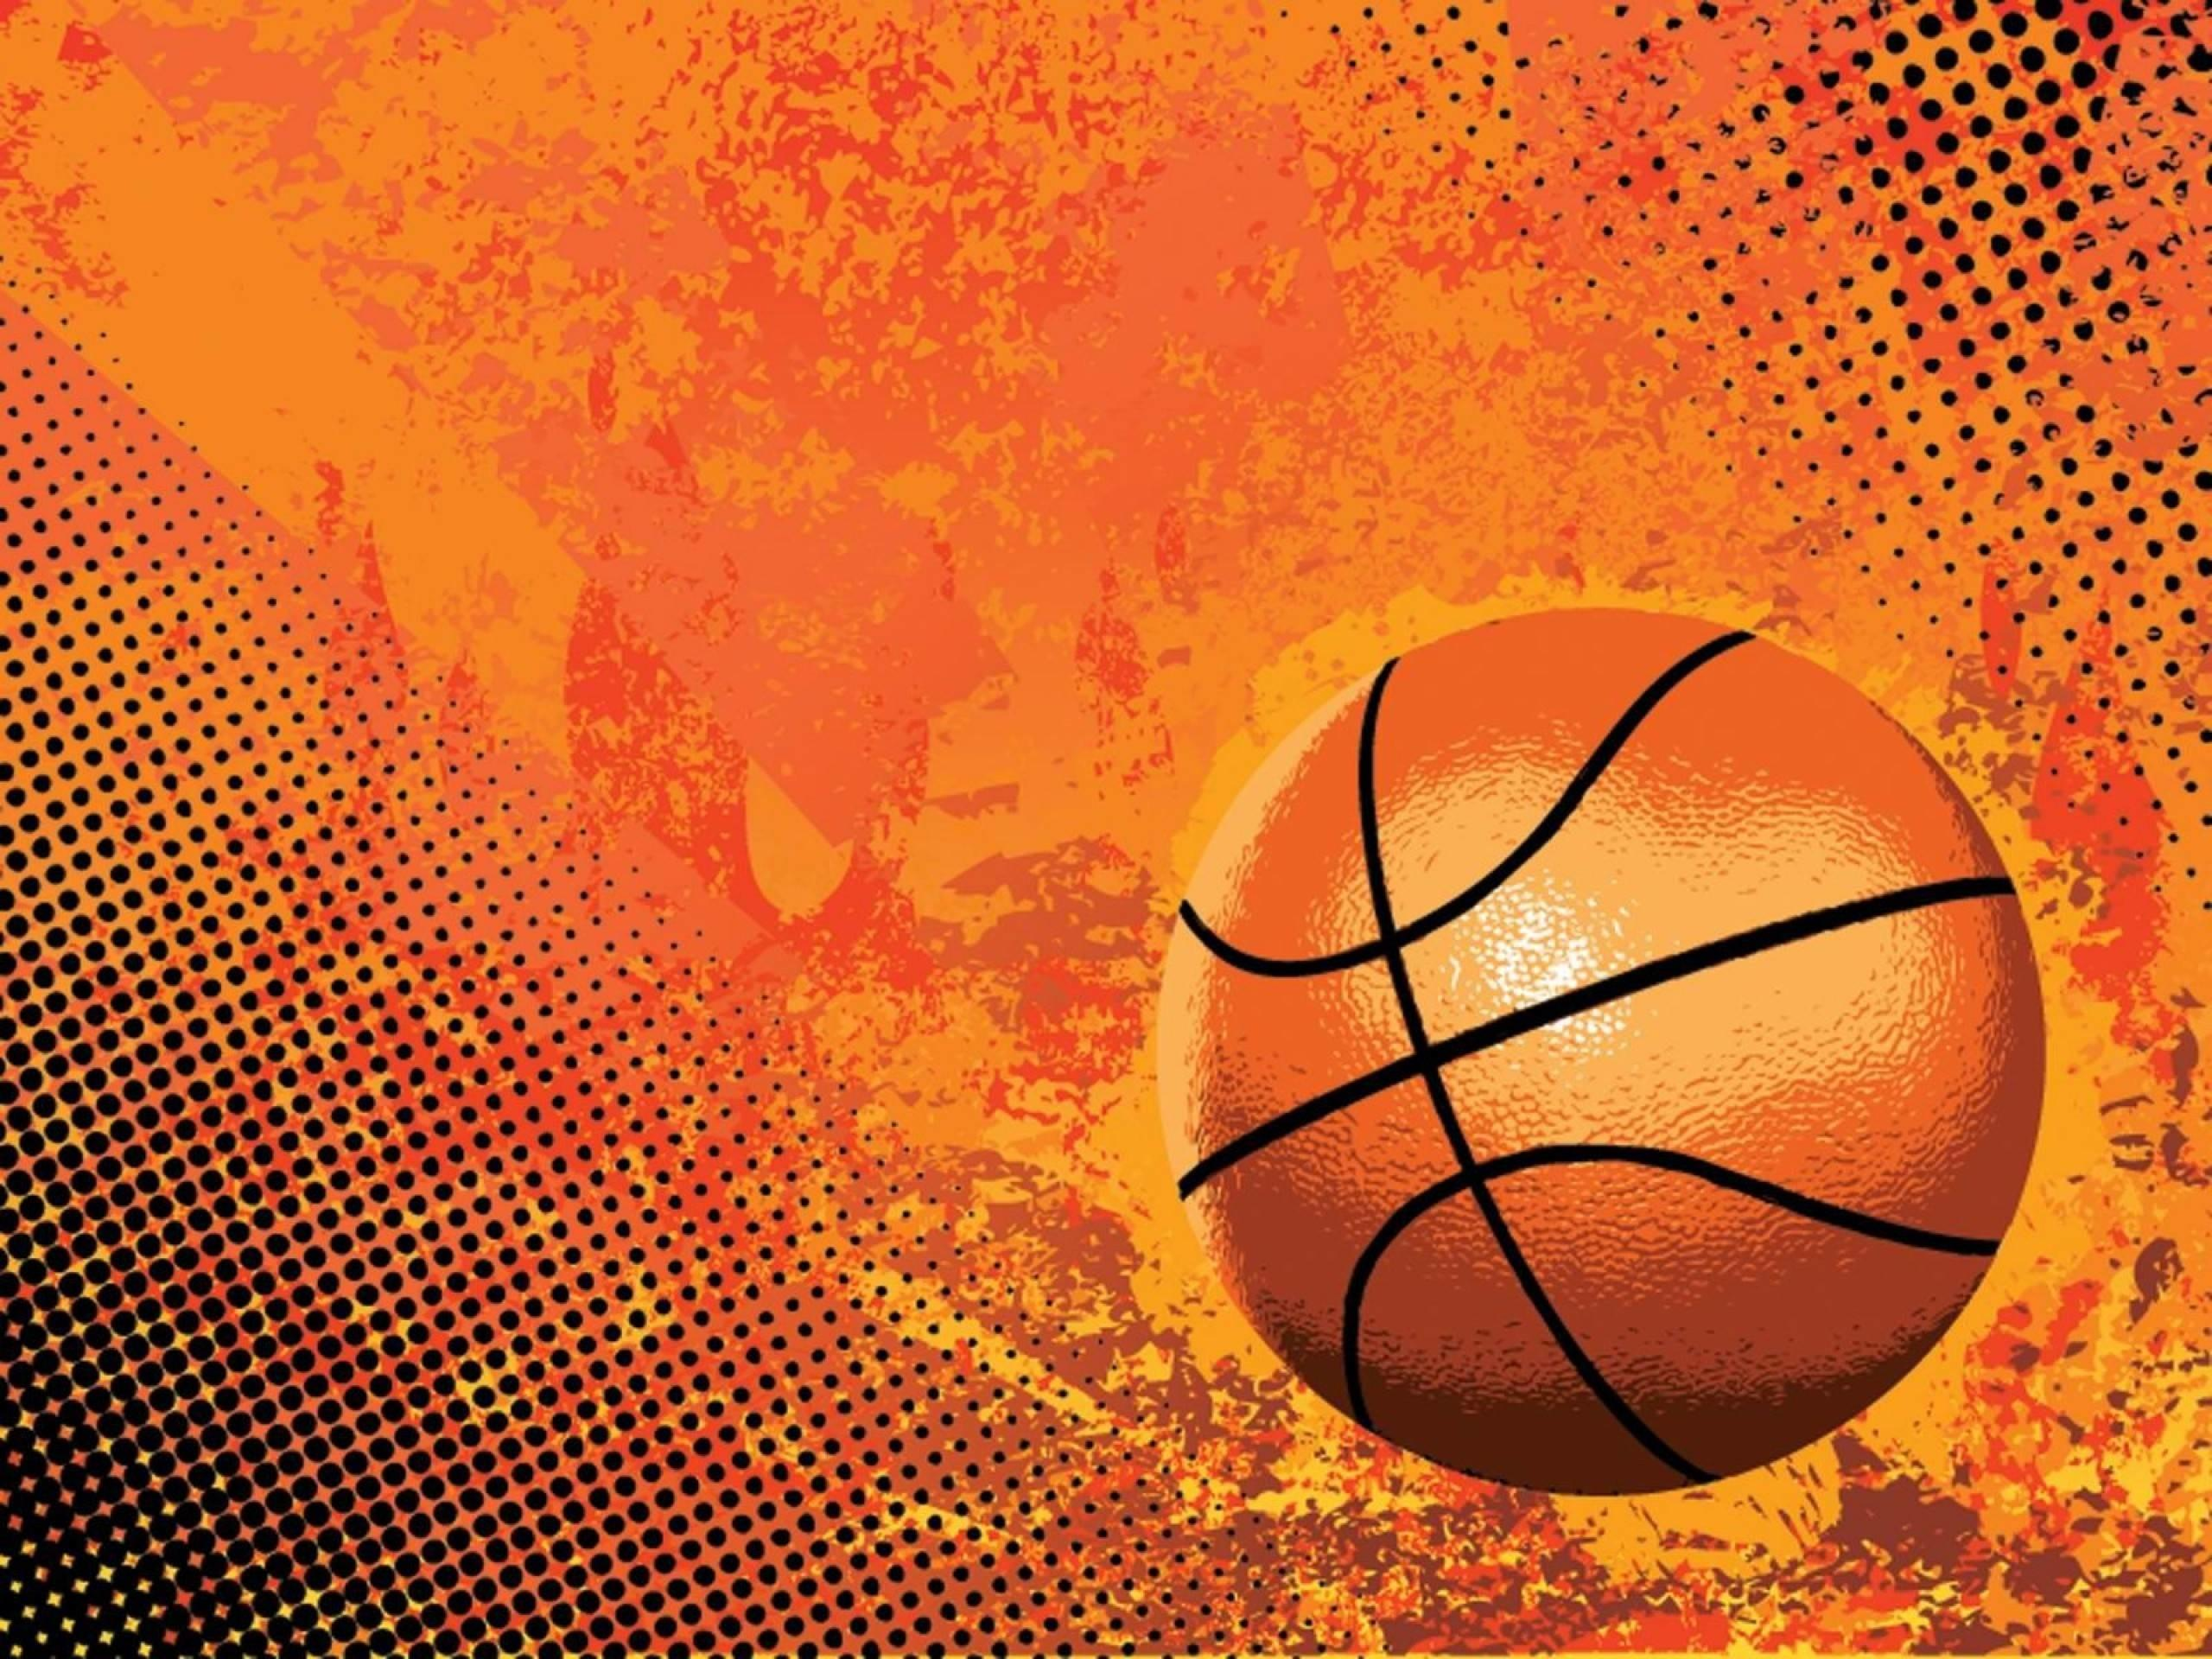 Free Sports Backgrounds Basketball Background 1600x1200 Wallpaper Teahub Io